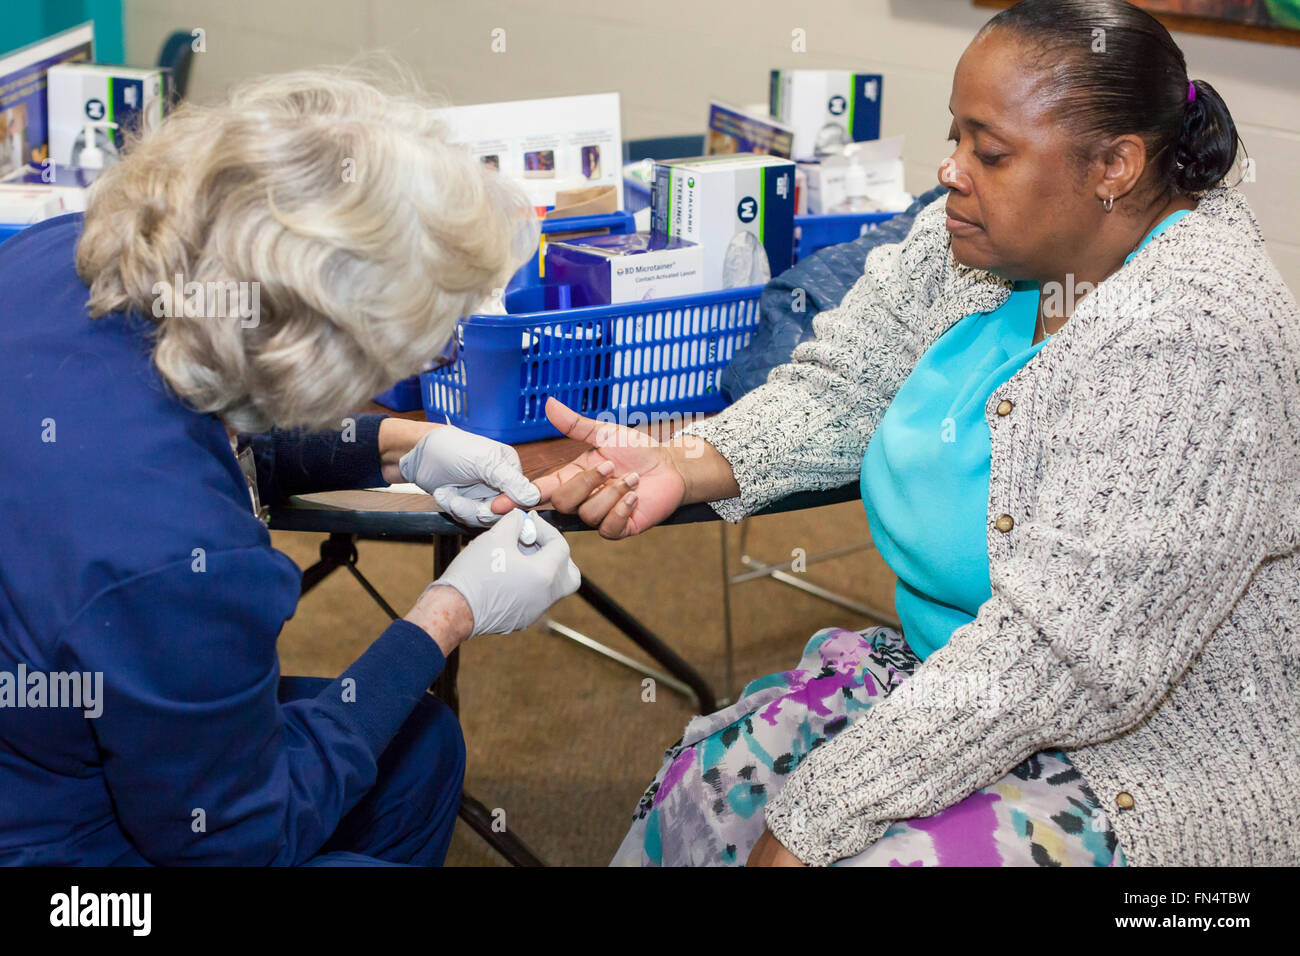 Flint, Michigan - Darron Garrett (right) has her blood drawn by volunteer nurse Bonnie Hudson to test for lead exposure. - Stock Image